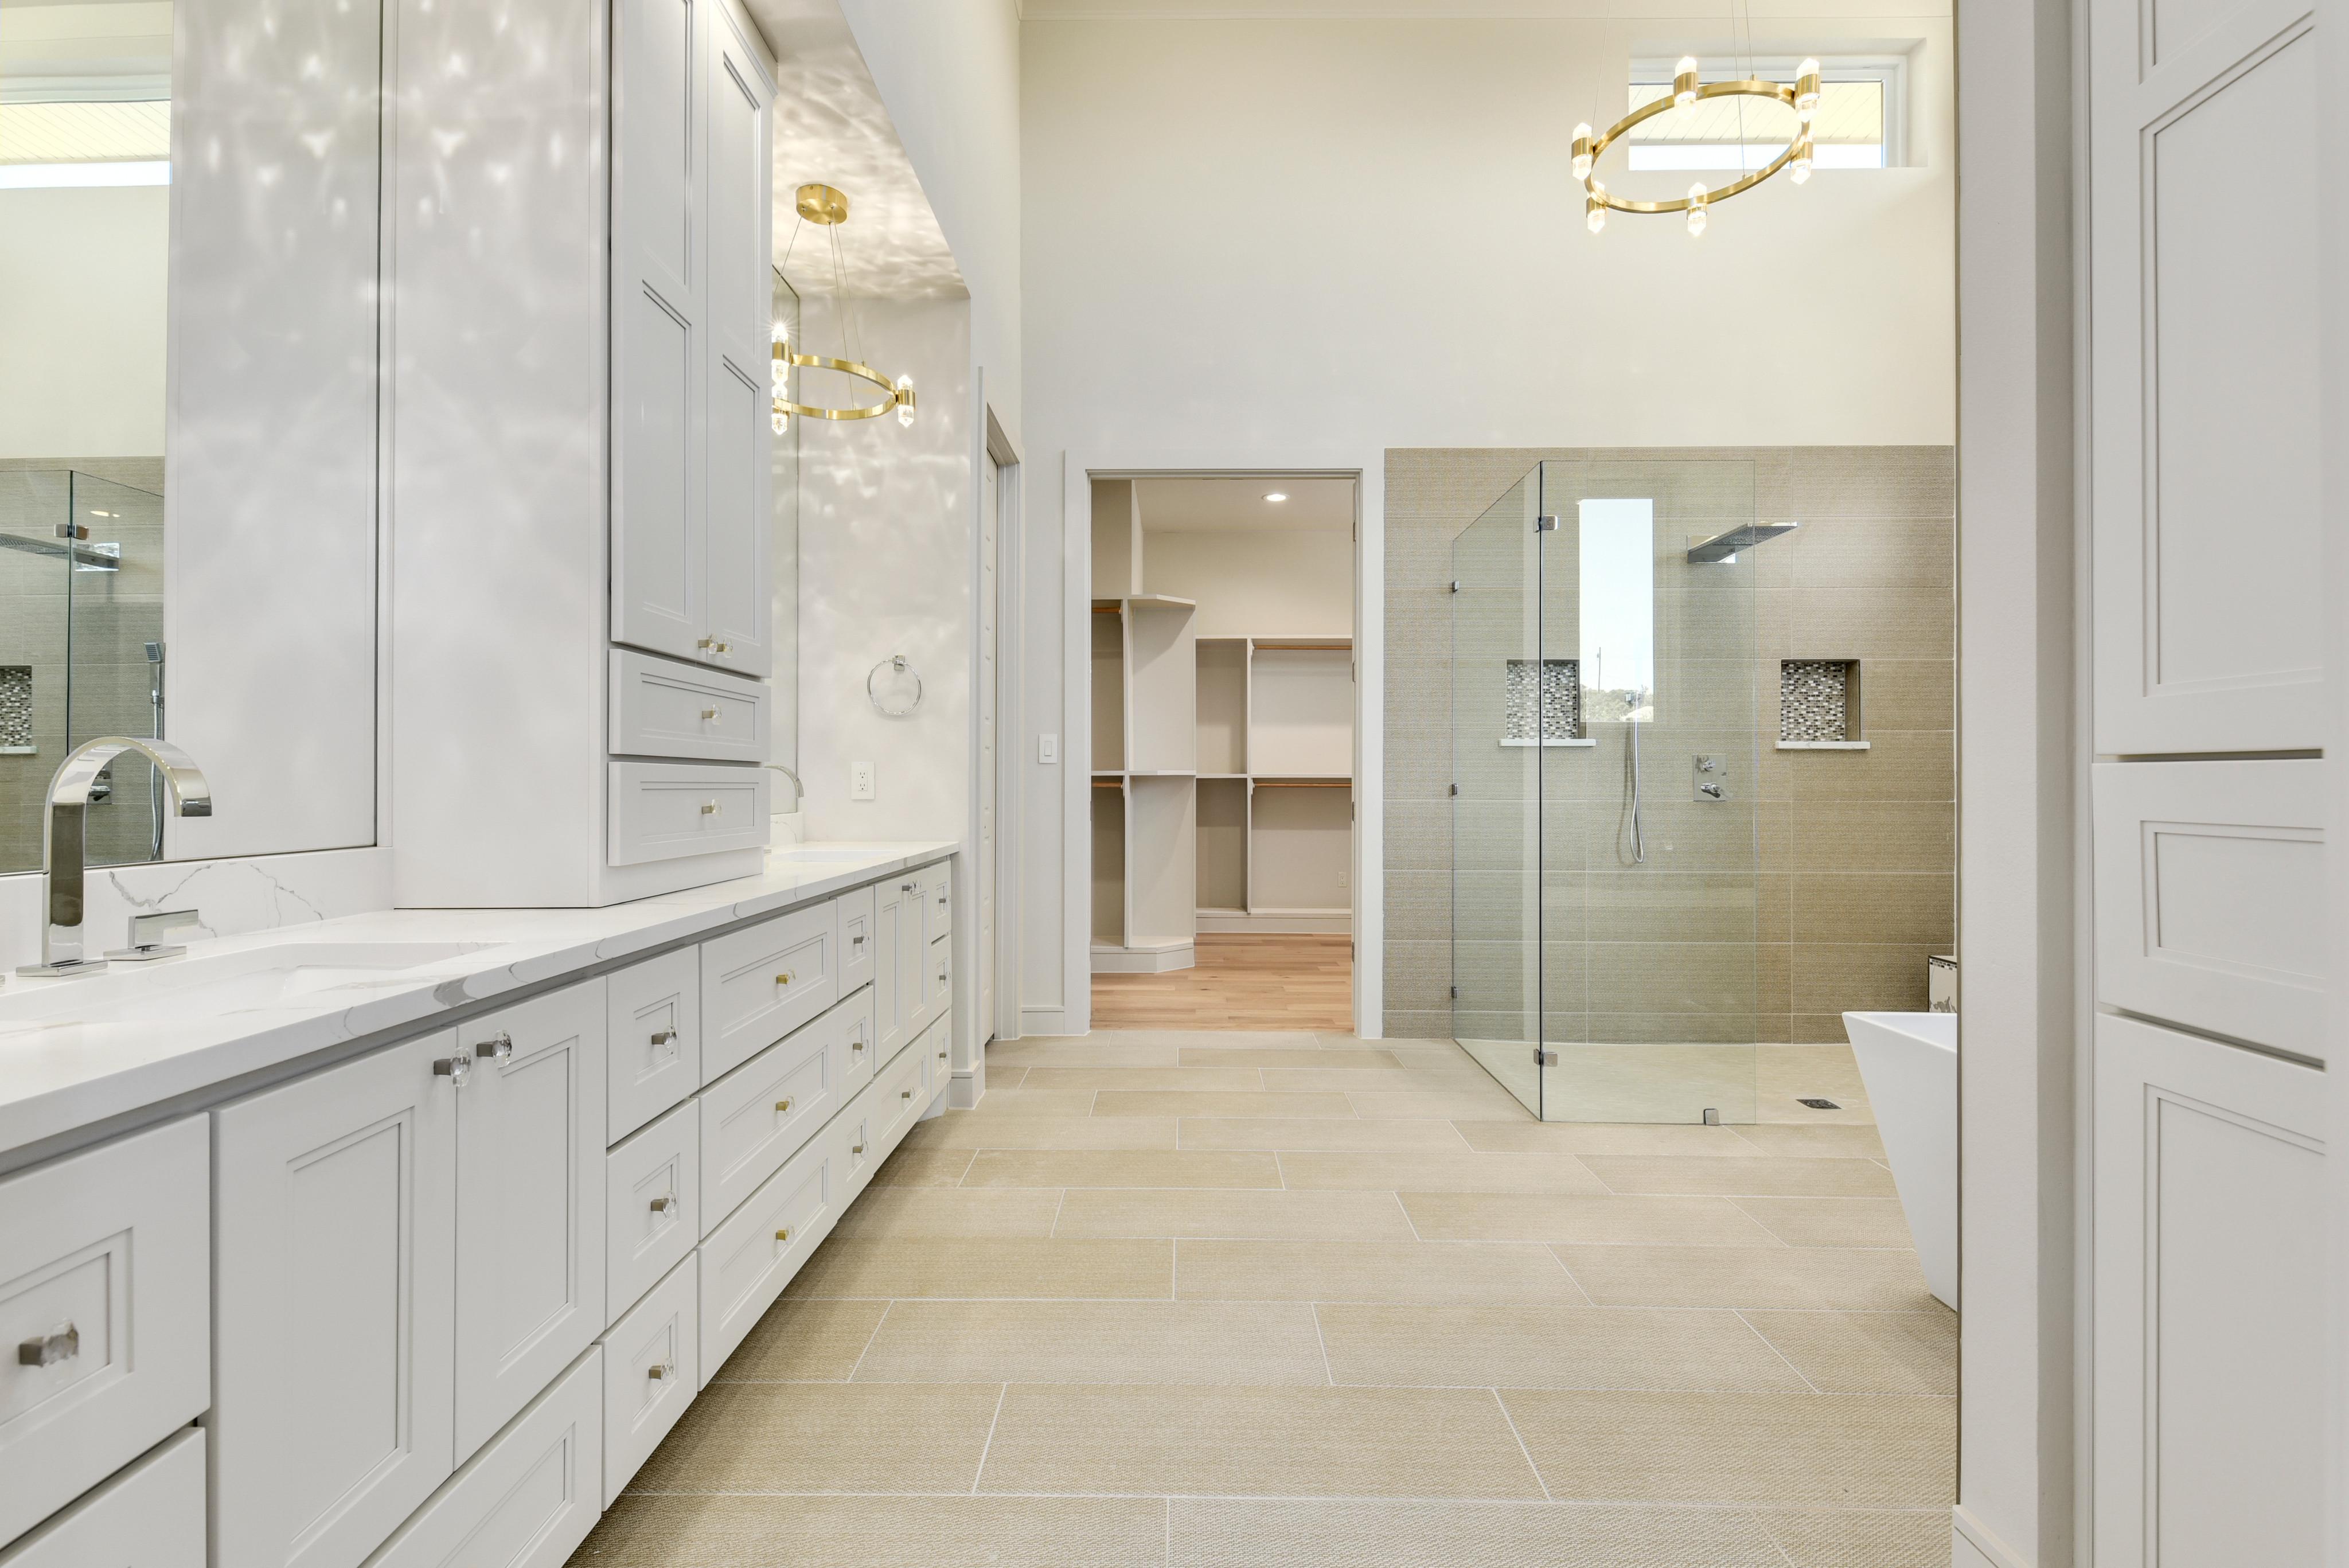 orig_109 Stephanie Lane bathroom.jpg